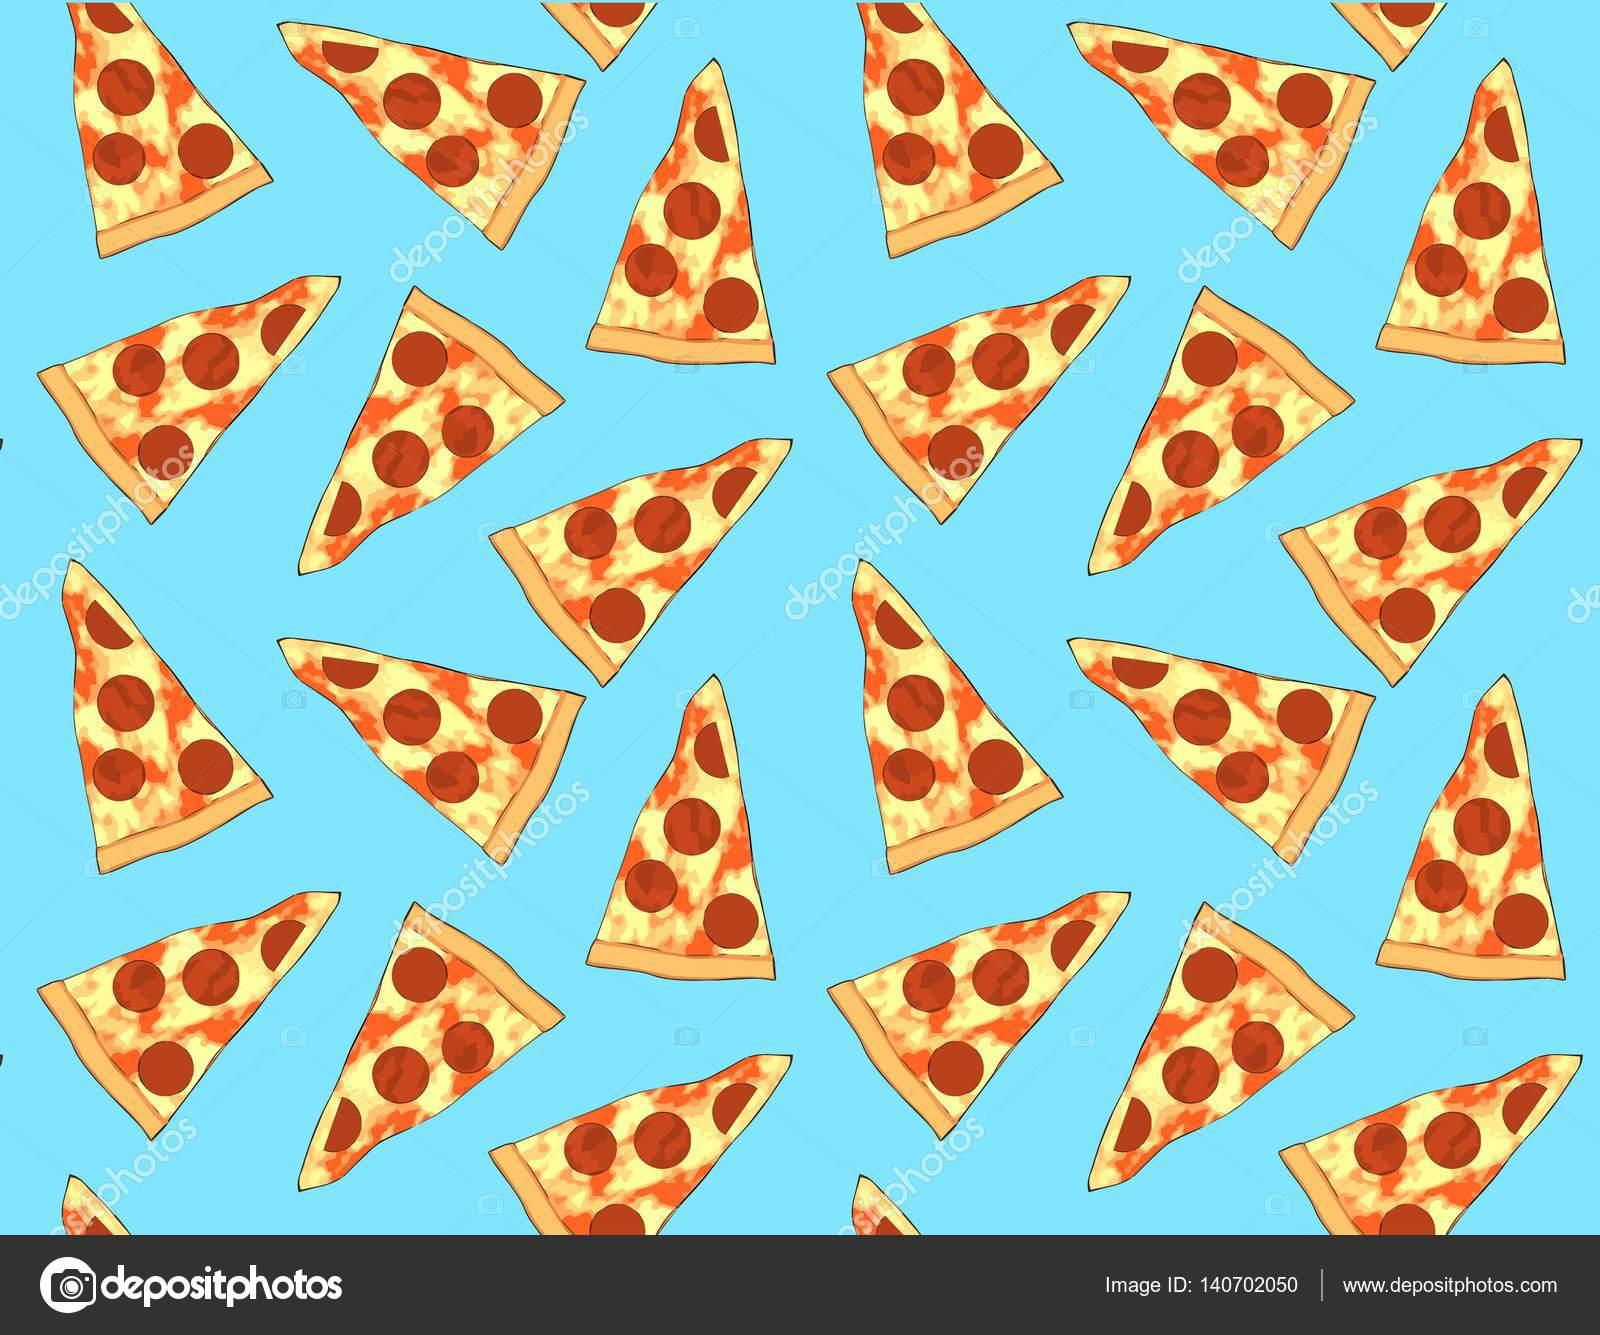 Pizza Slice Wallpaper | www.imgkid.com - The Image Kid Has It!